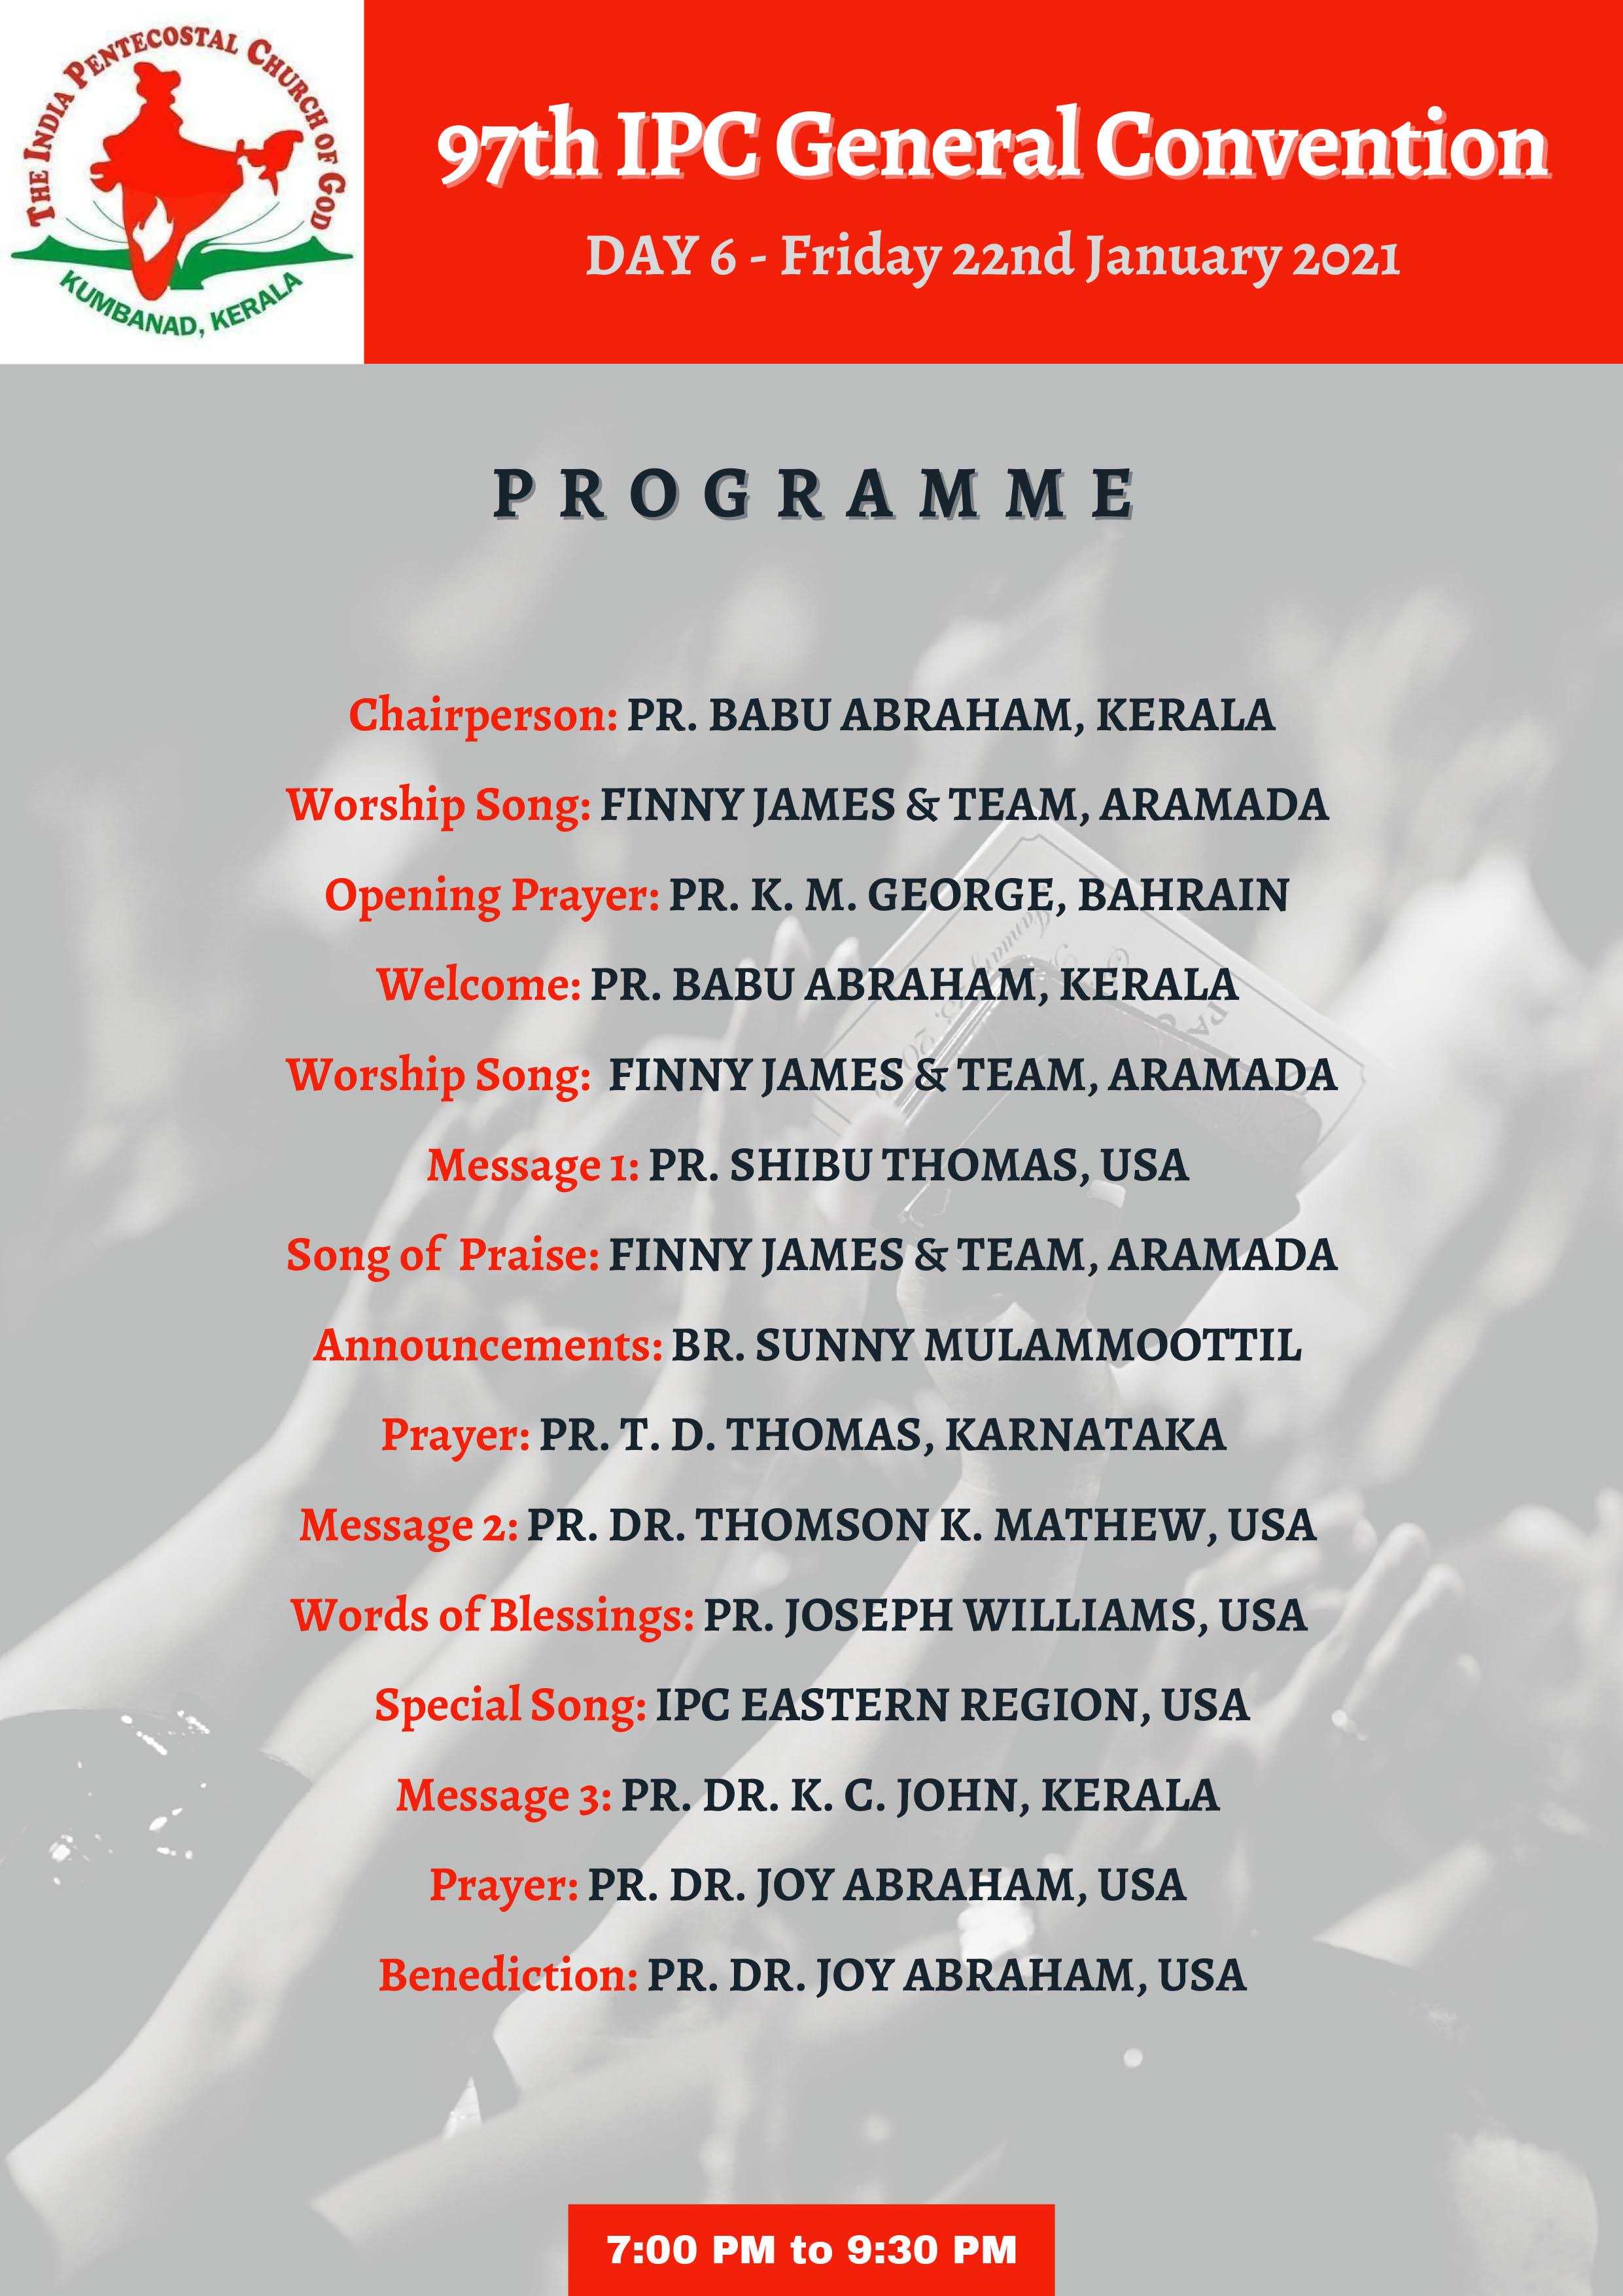 IPC-General-Convention-Day-6-Program